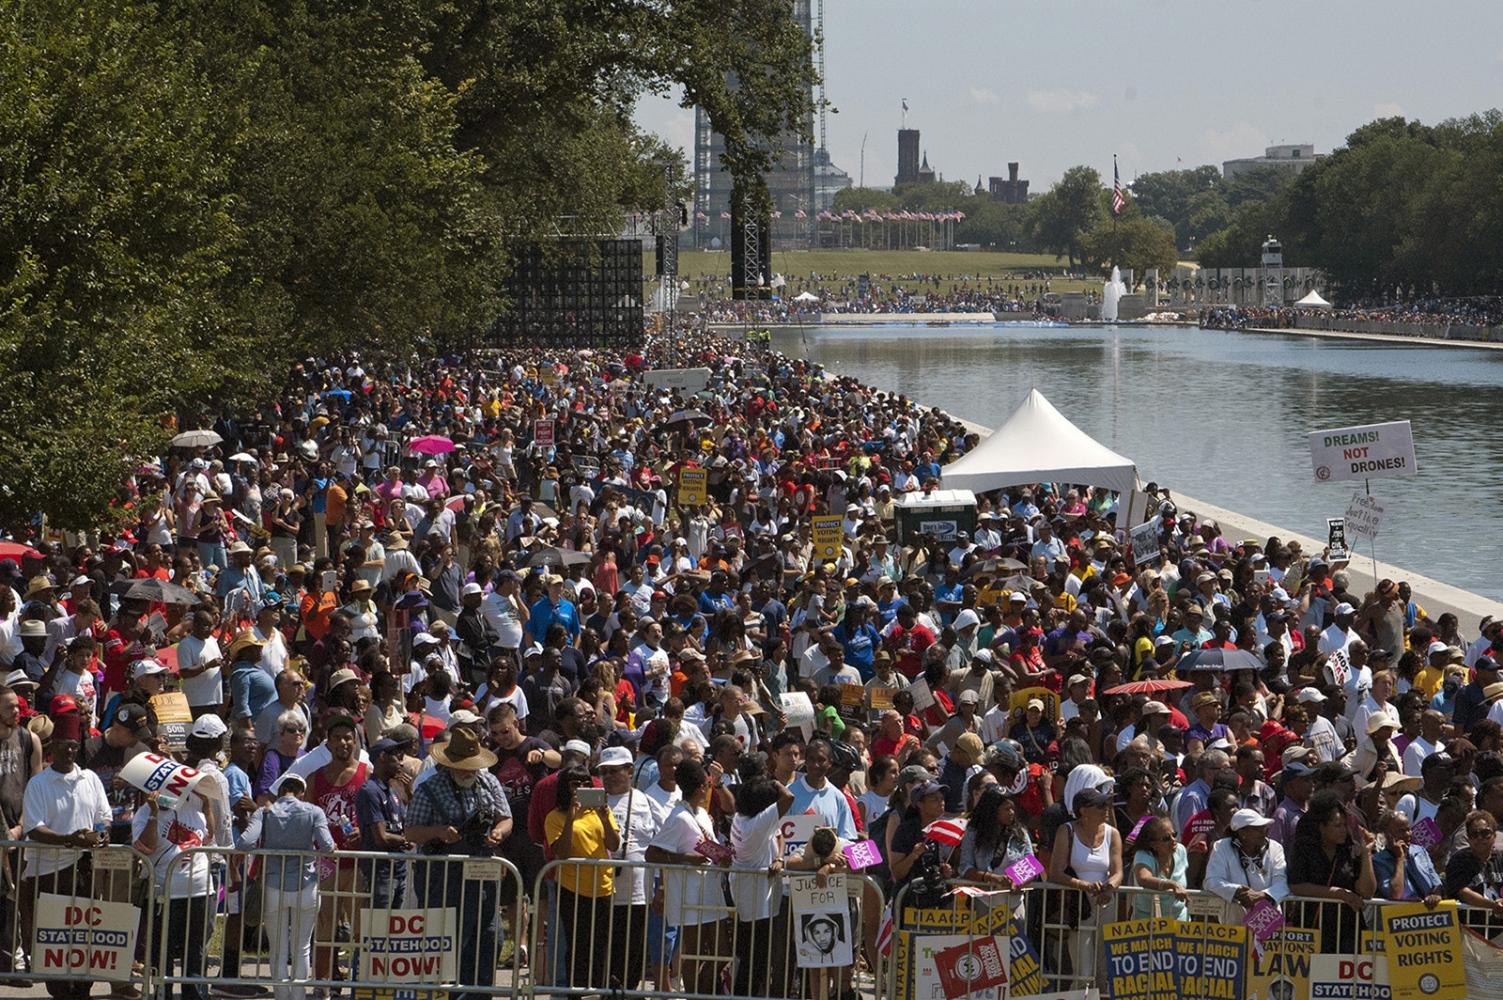 THE FIFTIETH ANNVERSARY OF THE MARTIN LUTHER KING JR. DREAM SPEECH, WASHINGTON D.C. 2013